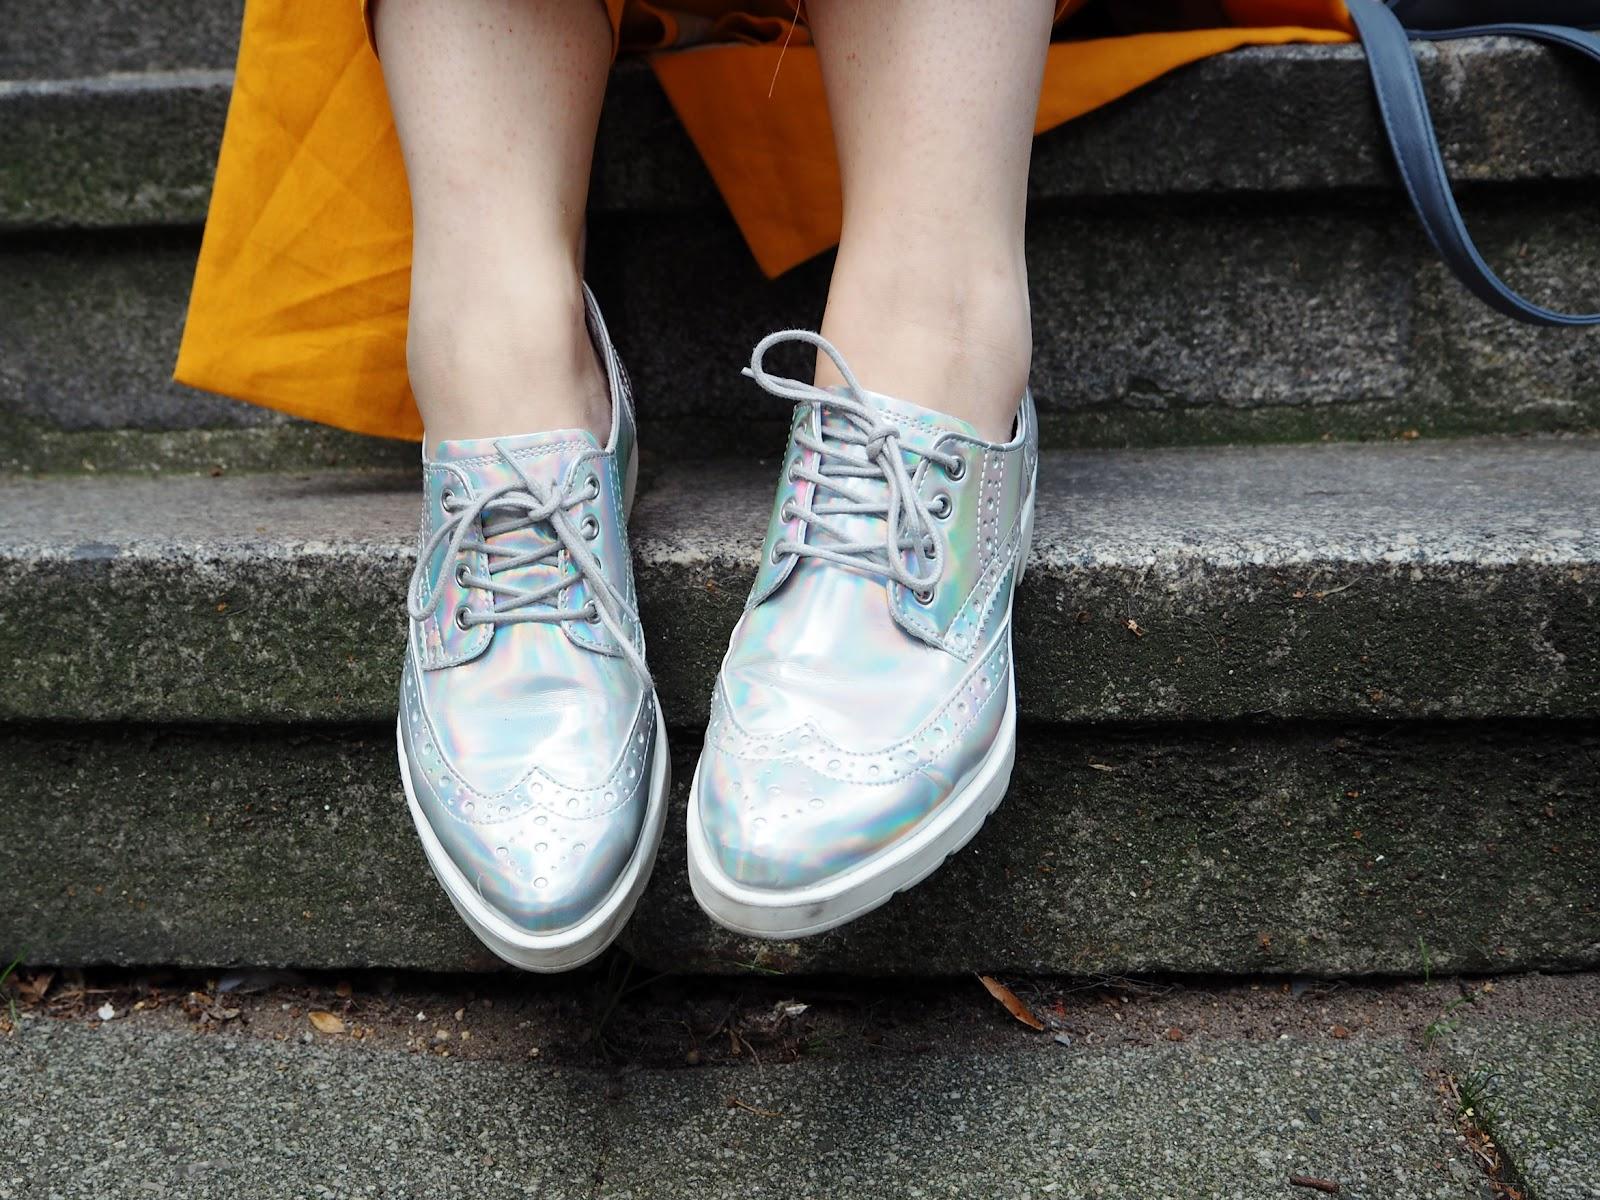 Schuhe, silber, chrome, trend, flache schuhe, flats, Herren schnürer, im herrenstil, Brogues